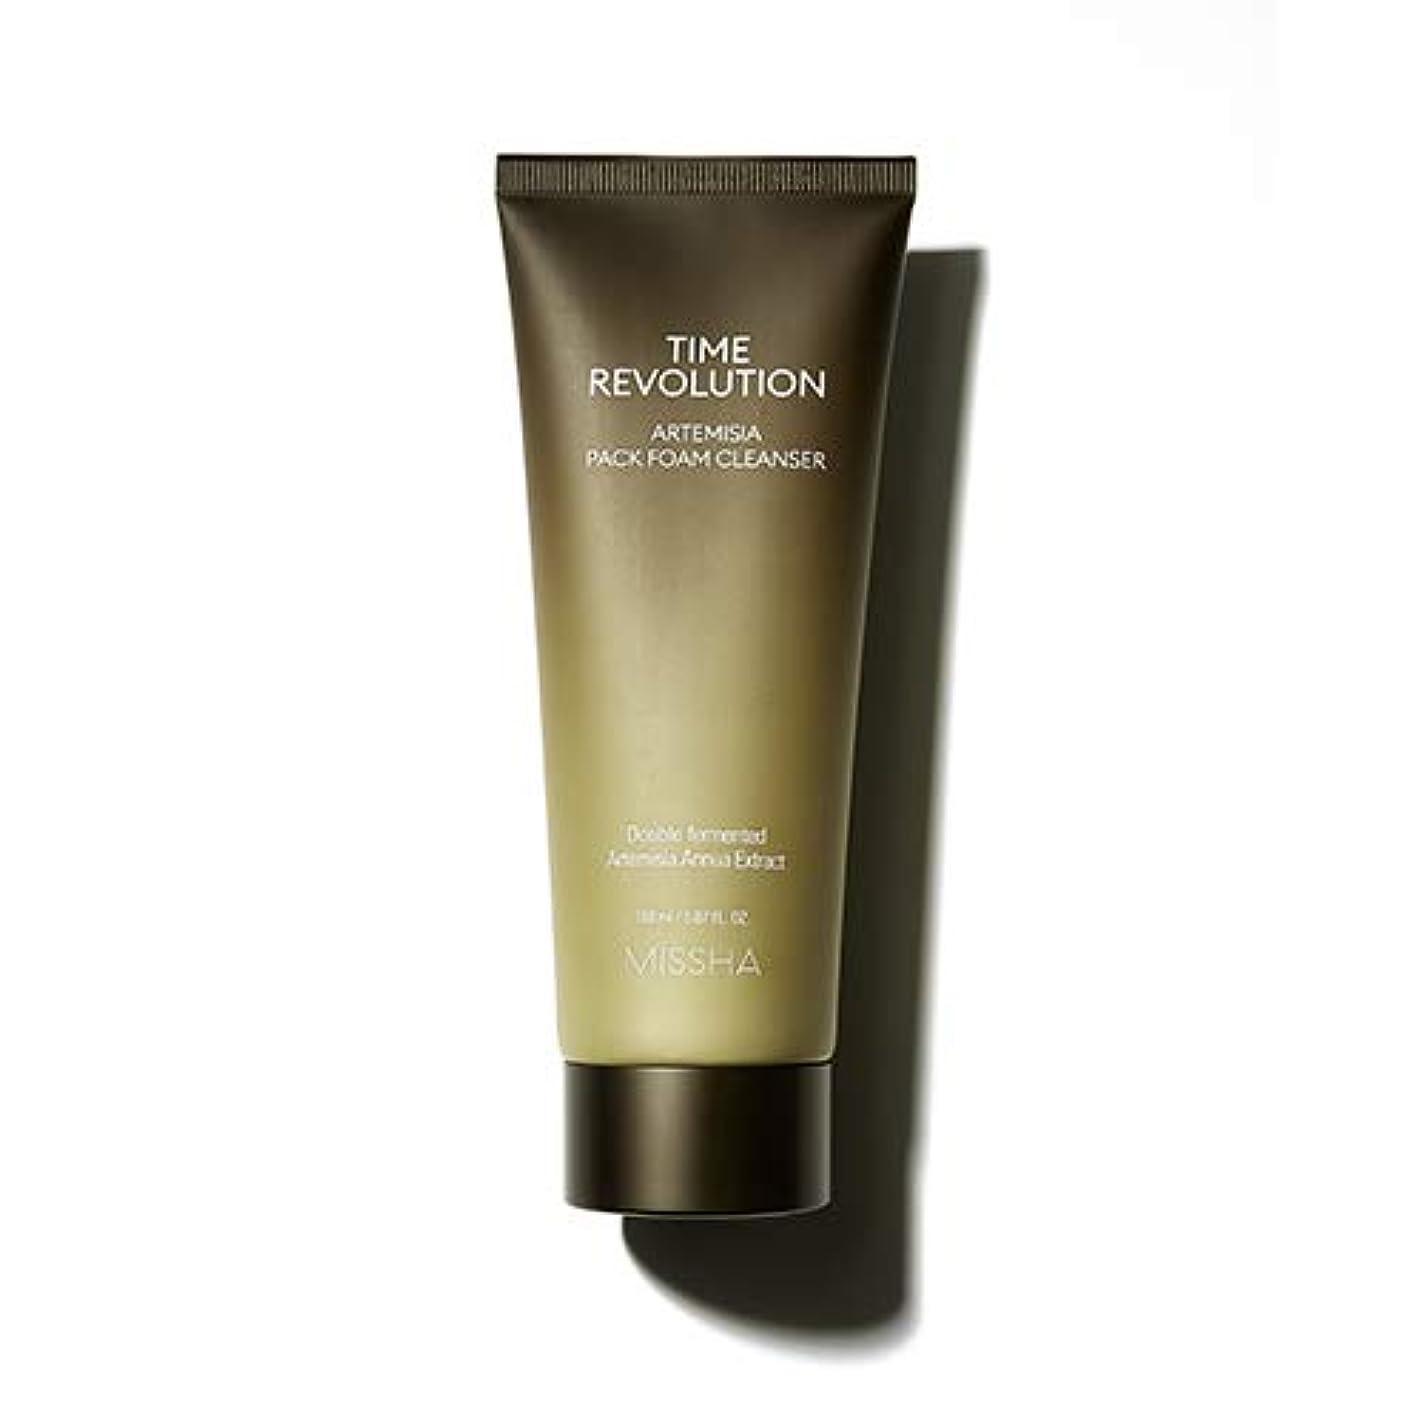 MISSHA タイムレボリューションアルテミシアパックフォームクレンザー/Time Revolution Artemisia Pack Foam Cleanser 150ml [並行輸入品]